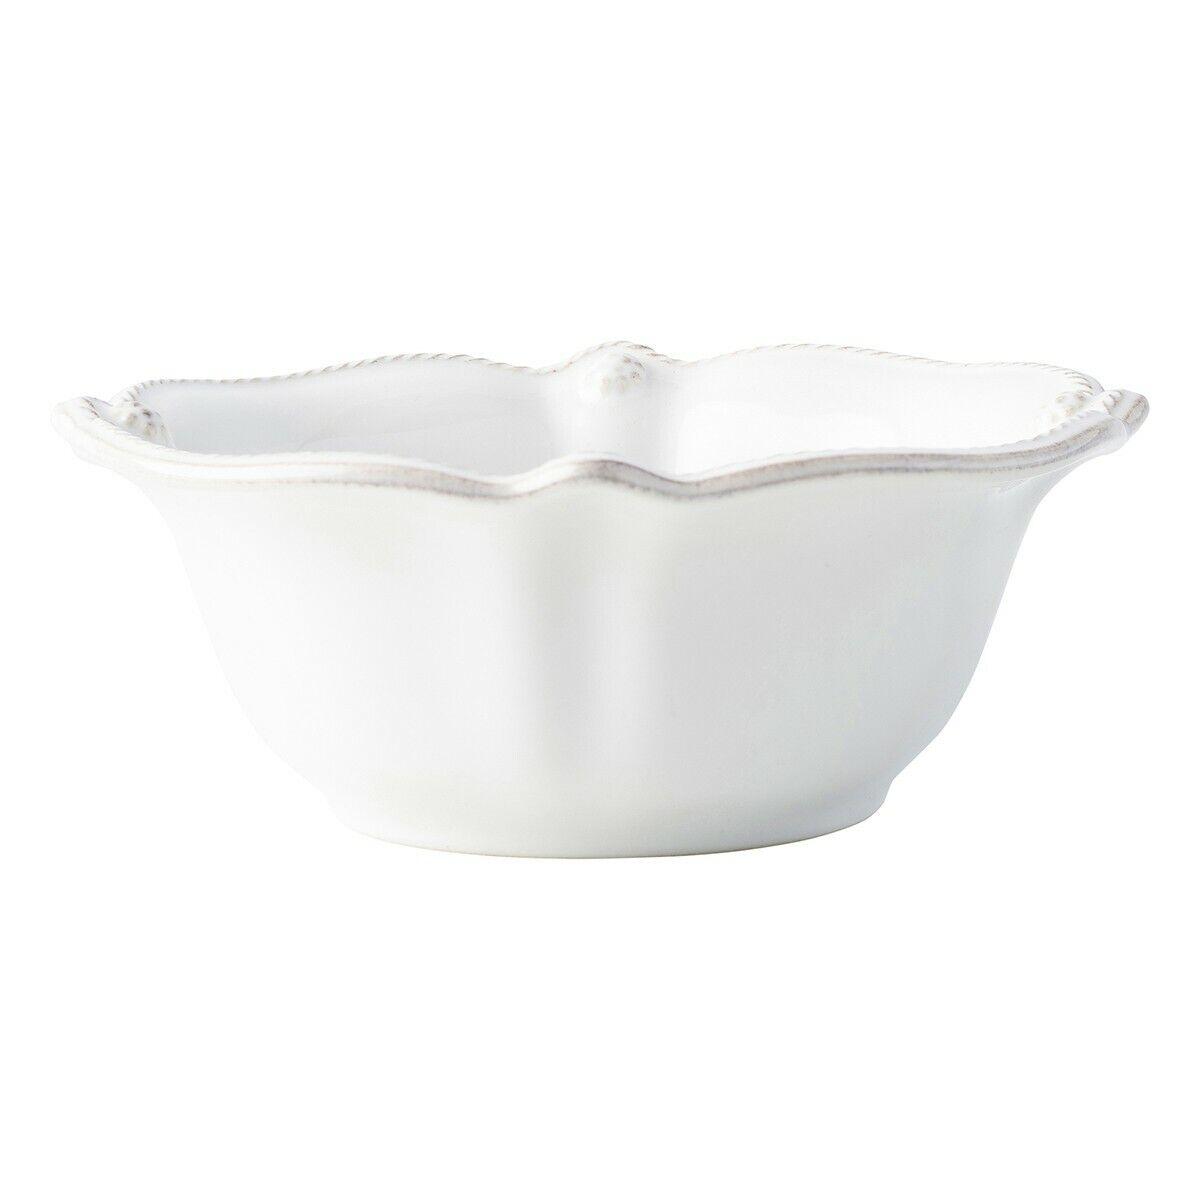 Juliska Berry & Thread blancwash céréales-Crème Glacée Bol-Lot de 8